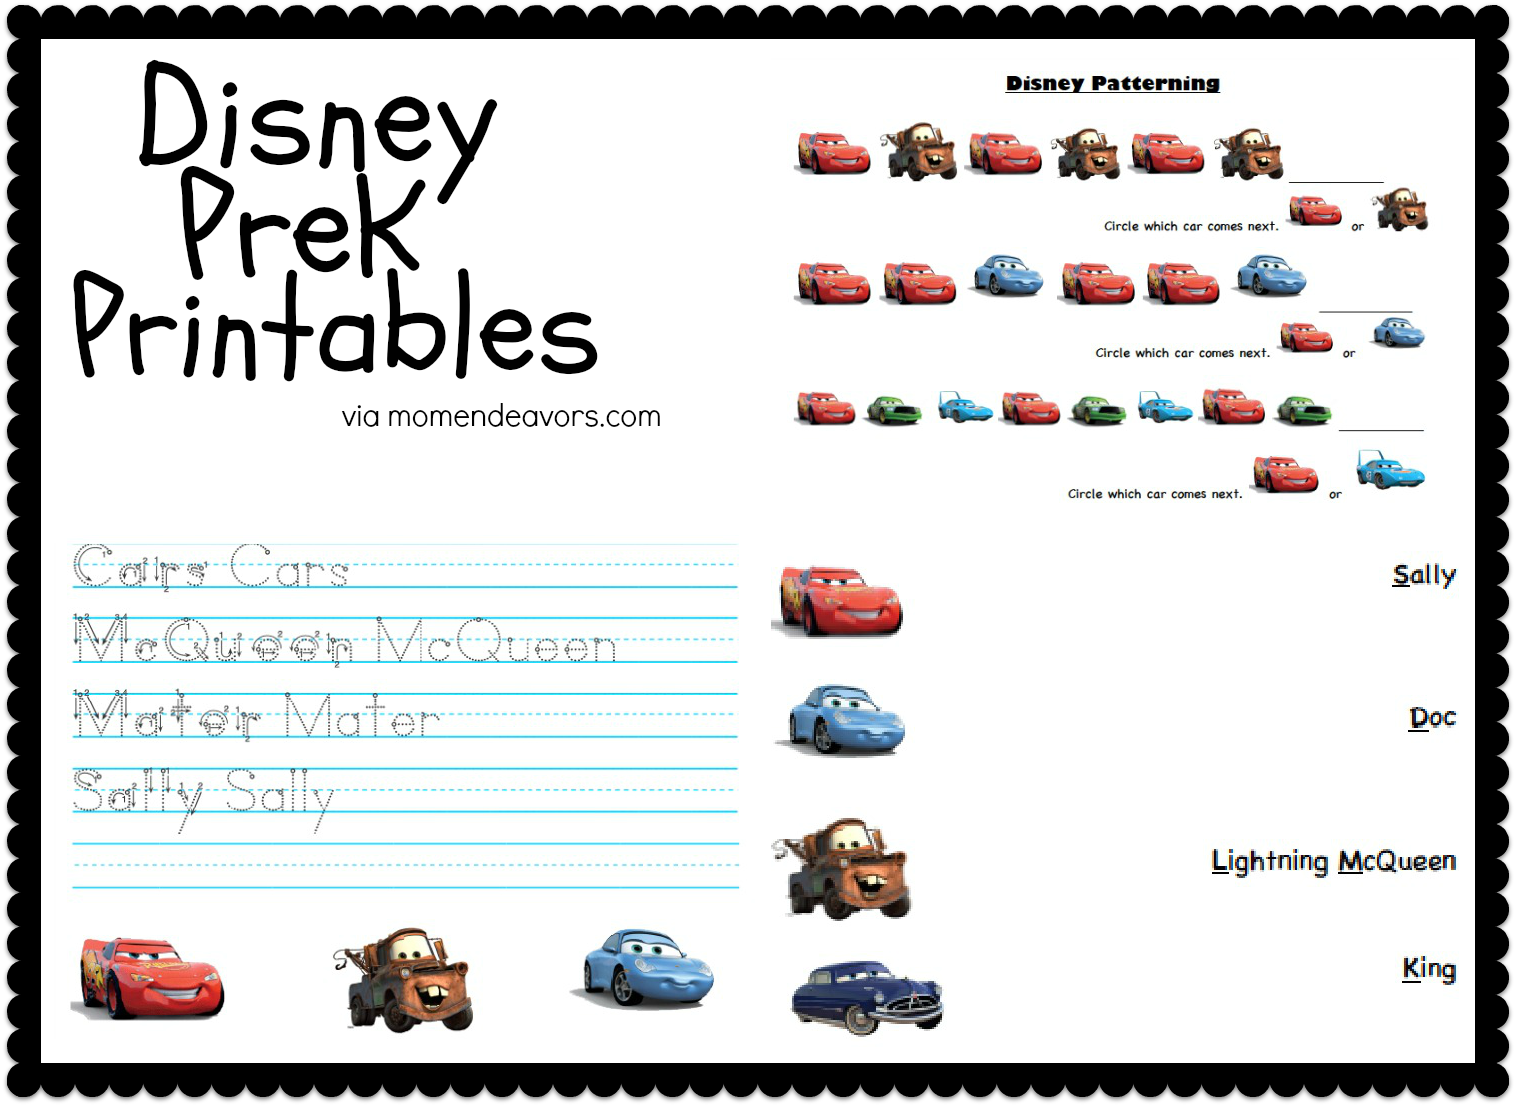 DisneyPixar CARS PreK Printable Activity Sheets Disney